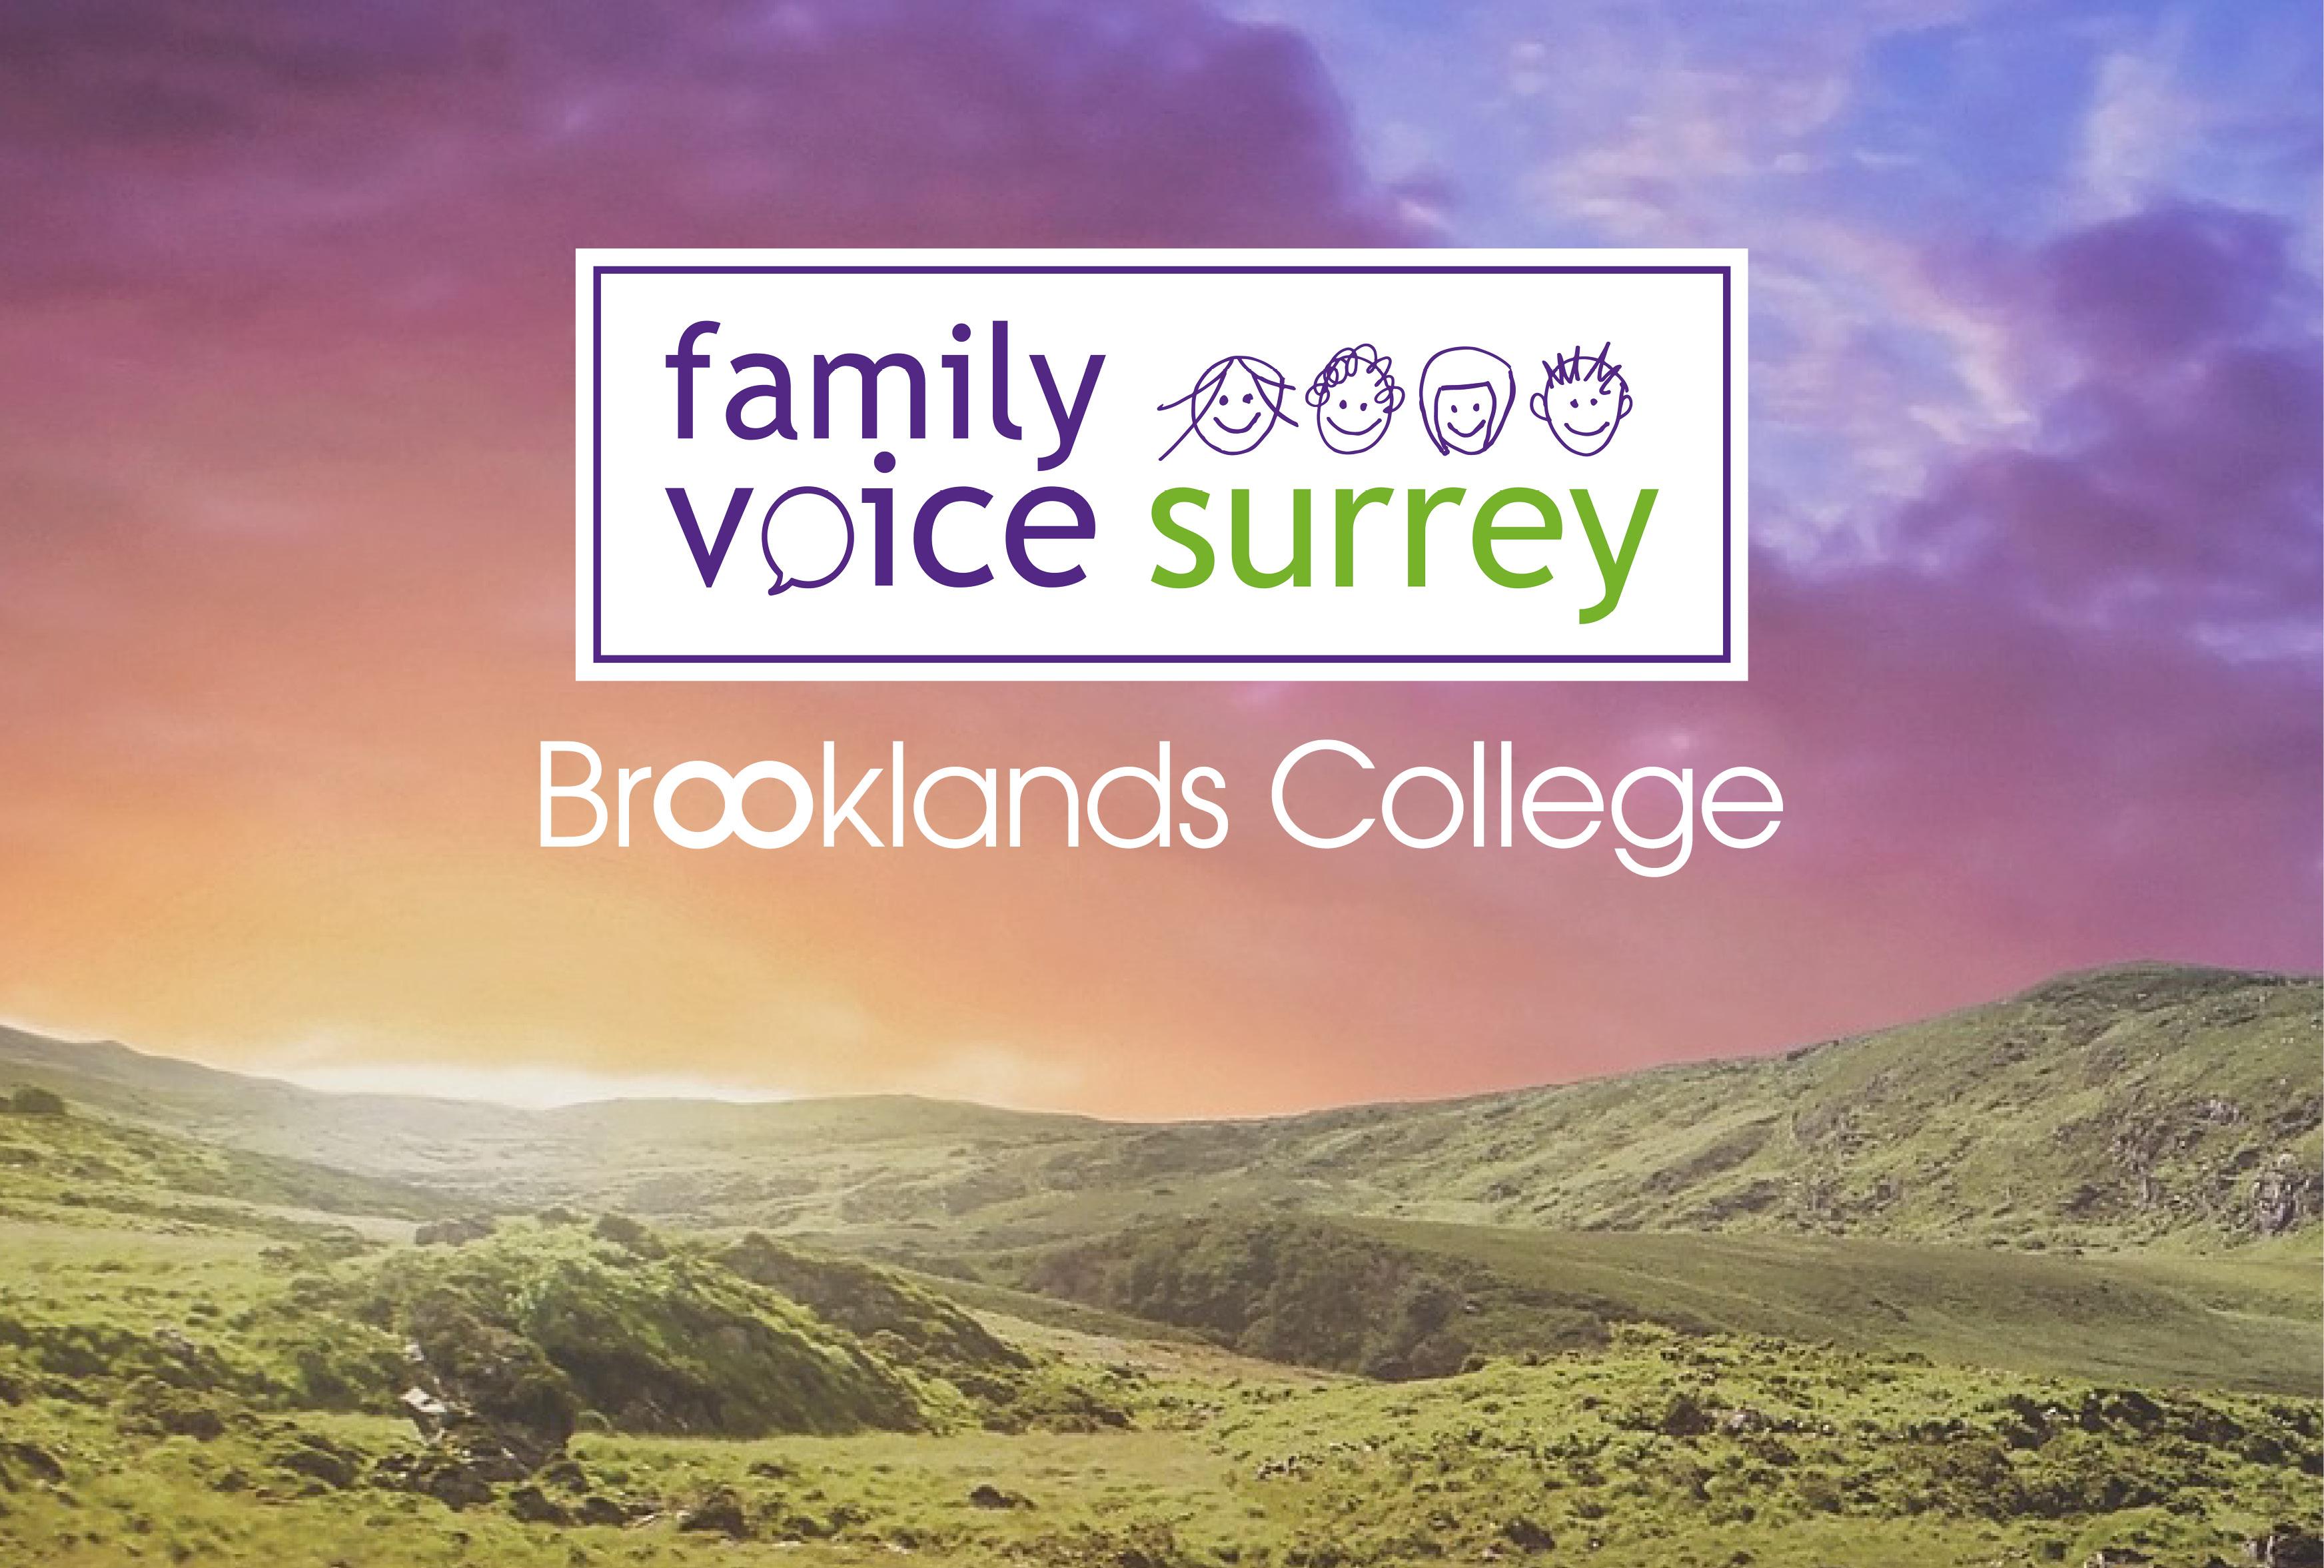 Family Voice Surrey Programme